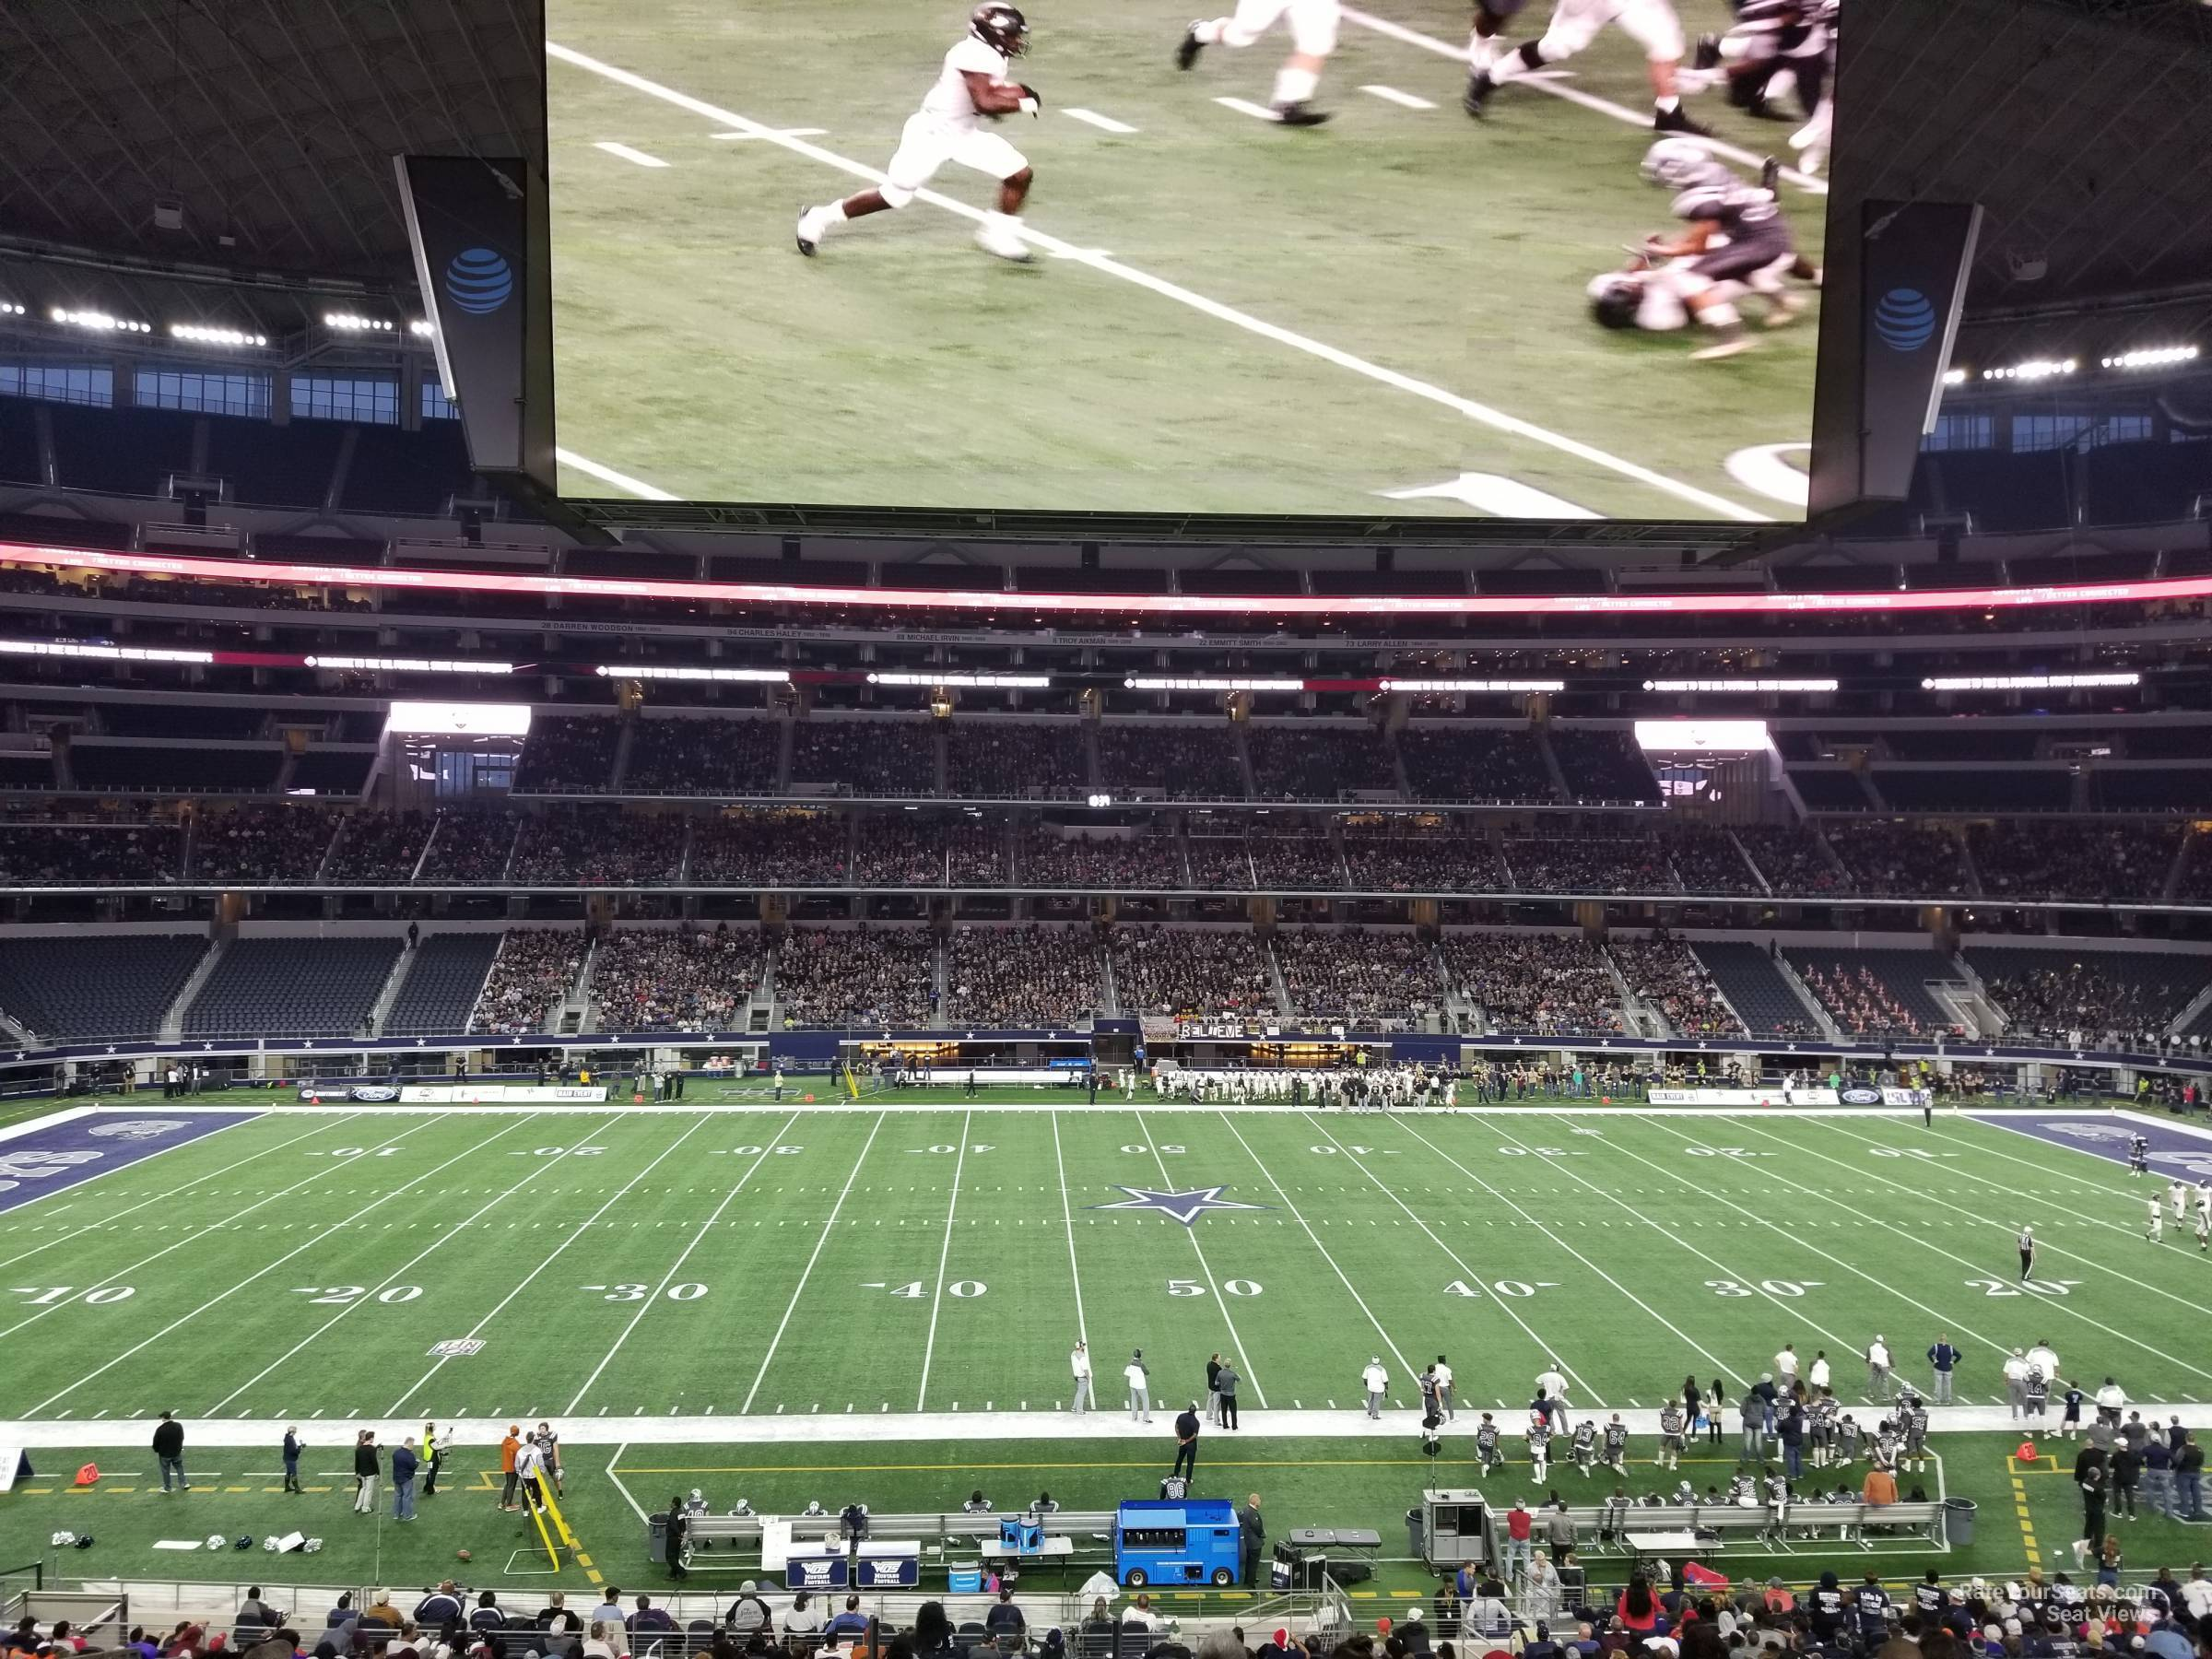 AT&T Stadium Section C210 - Dallas Cowboys - RateYourSeats.com